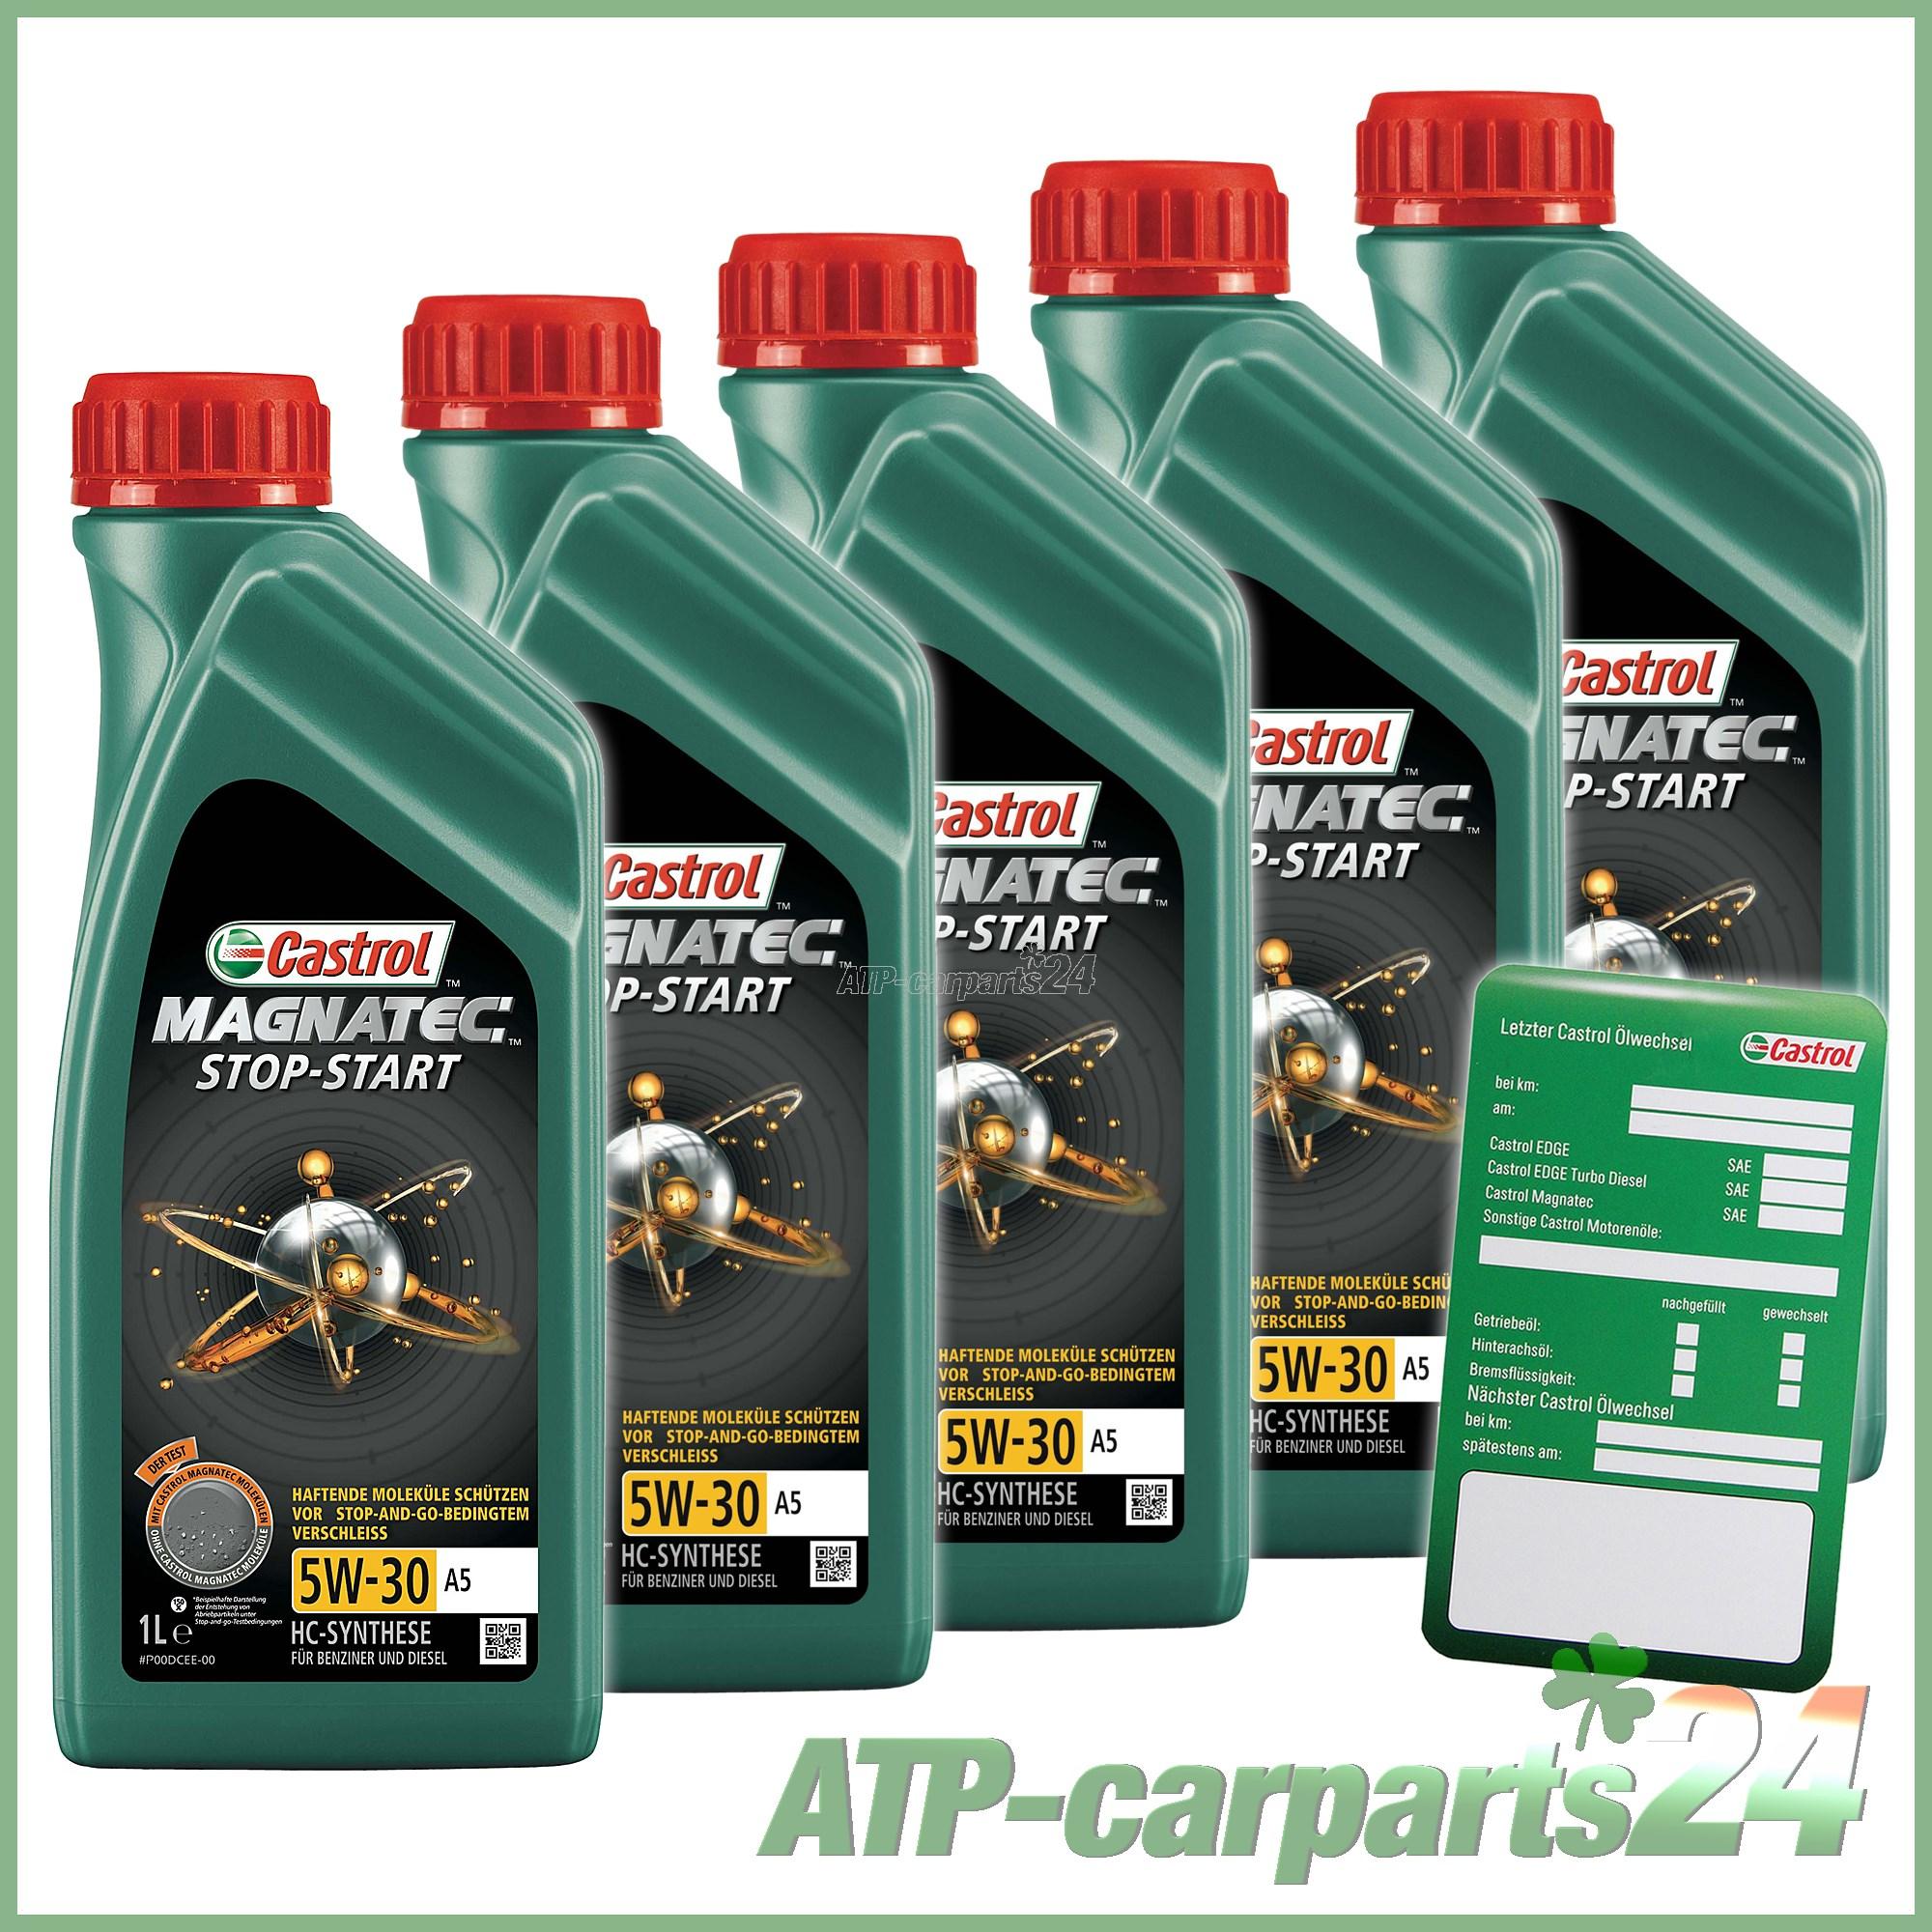 Castrol Oil Change >> Details About 5x 1 L Litre Castrol Magnatec Stop Start 5w 30 A5 Car Engine Motor Oil Label